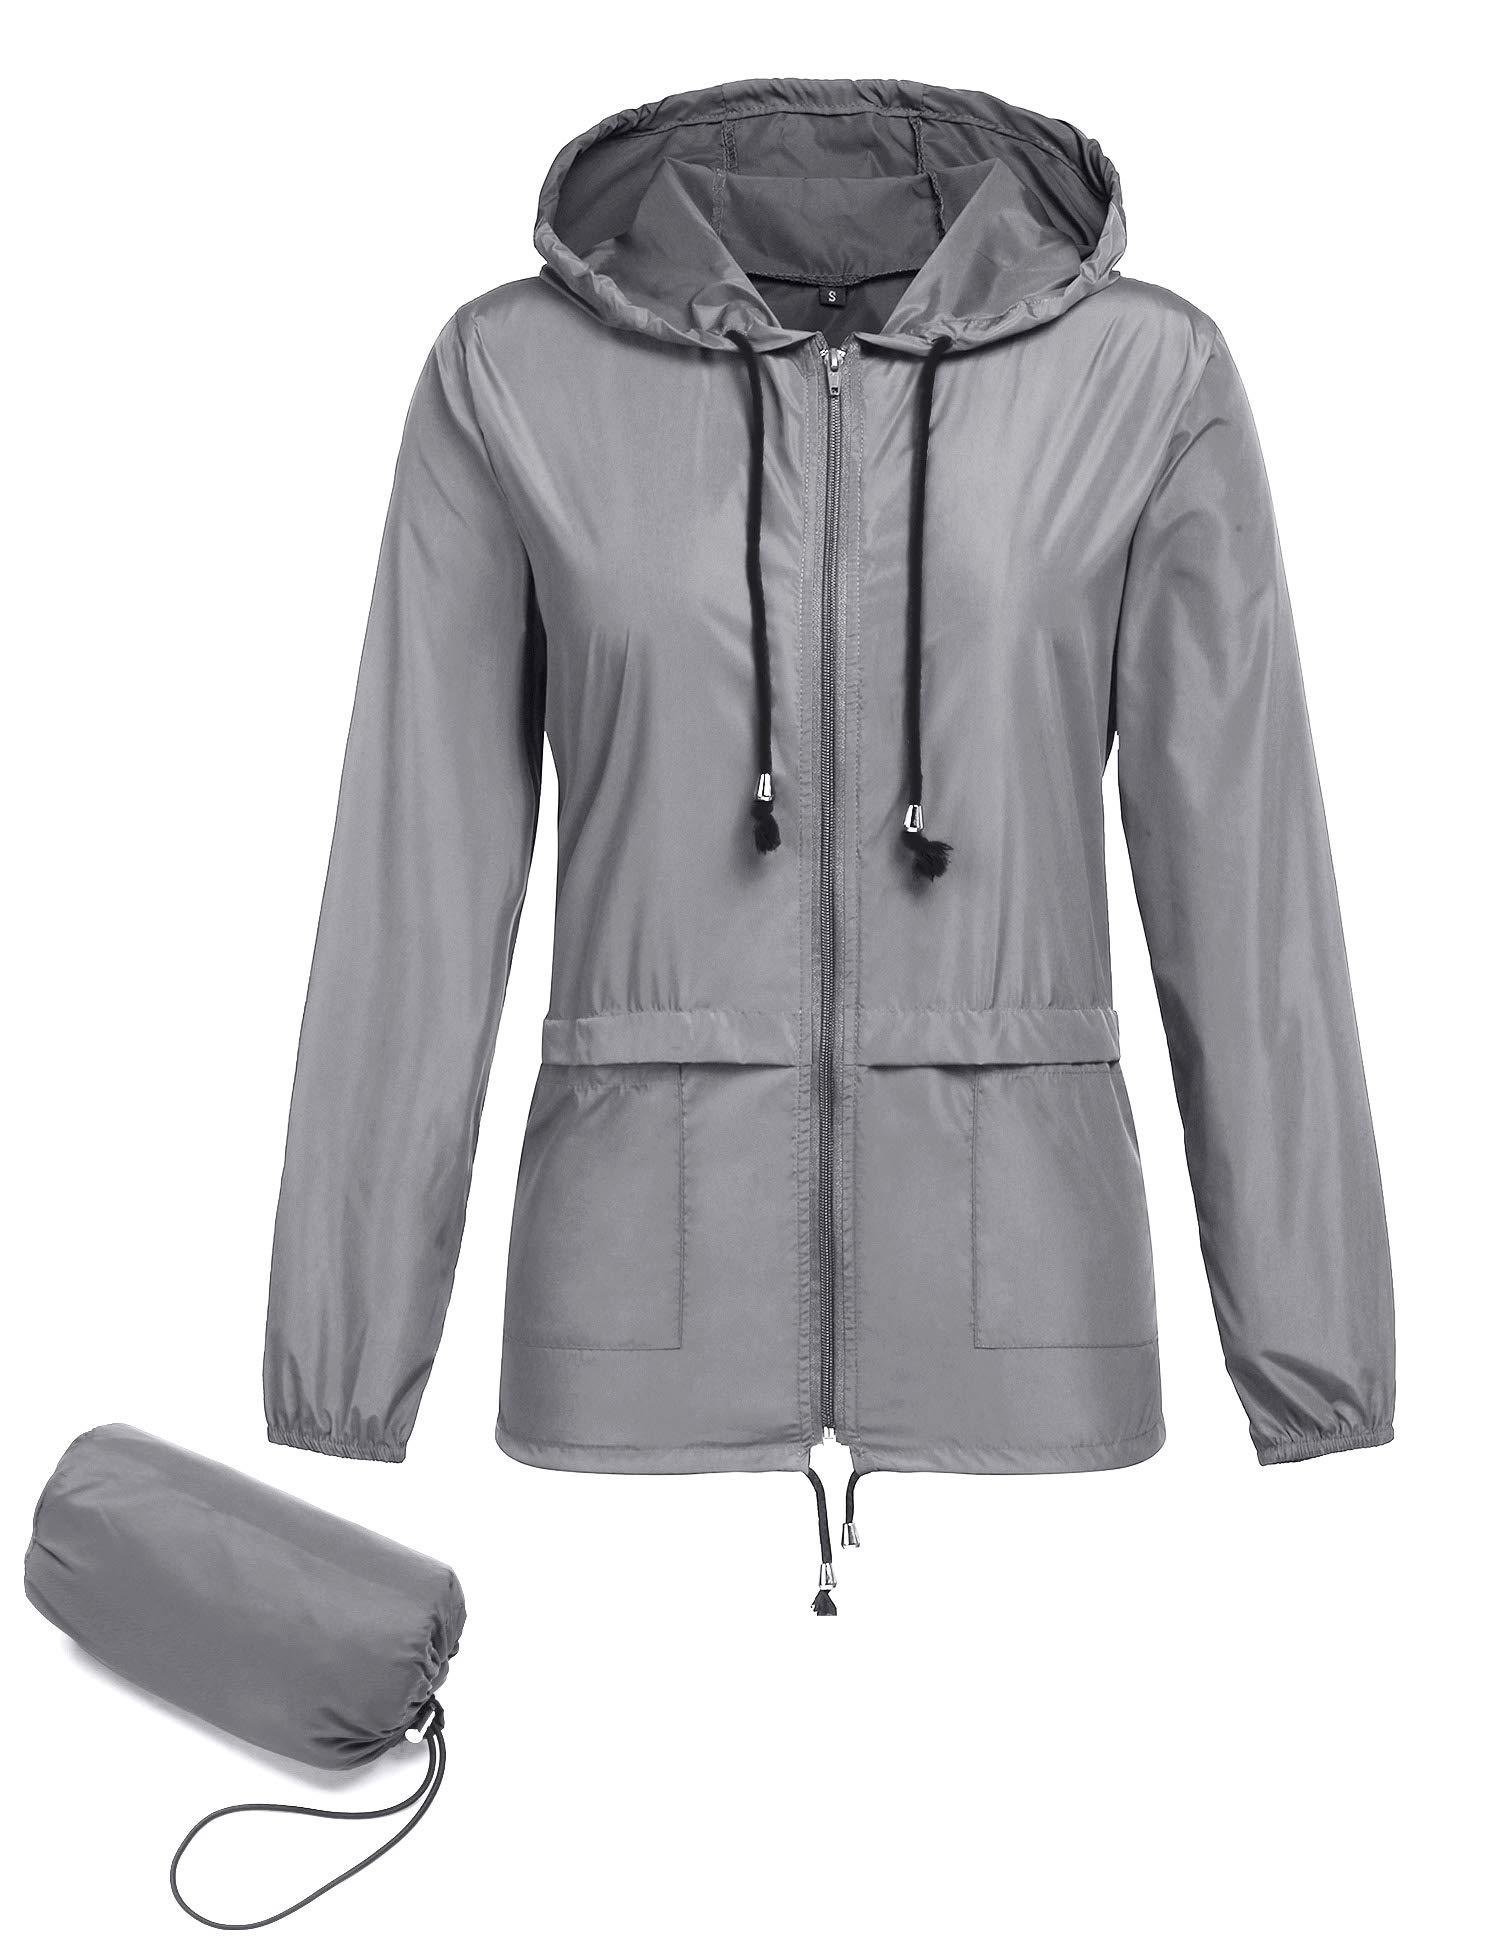 Women's Lightweight Raincoat,Waterproof Active Outdoor Travel Hiking Rain Jacket Lightweight Travel Trench Raincoat